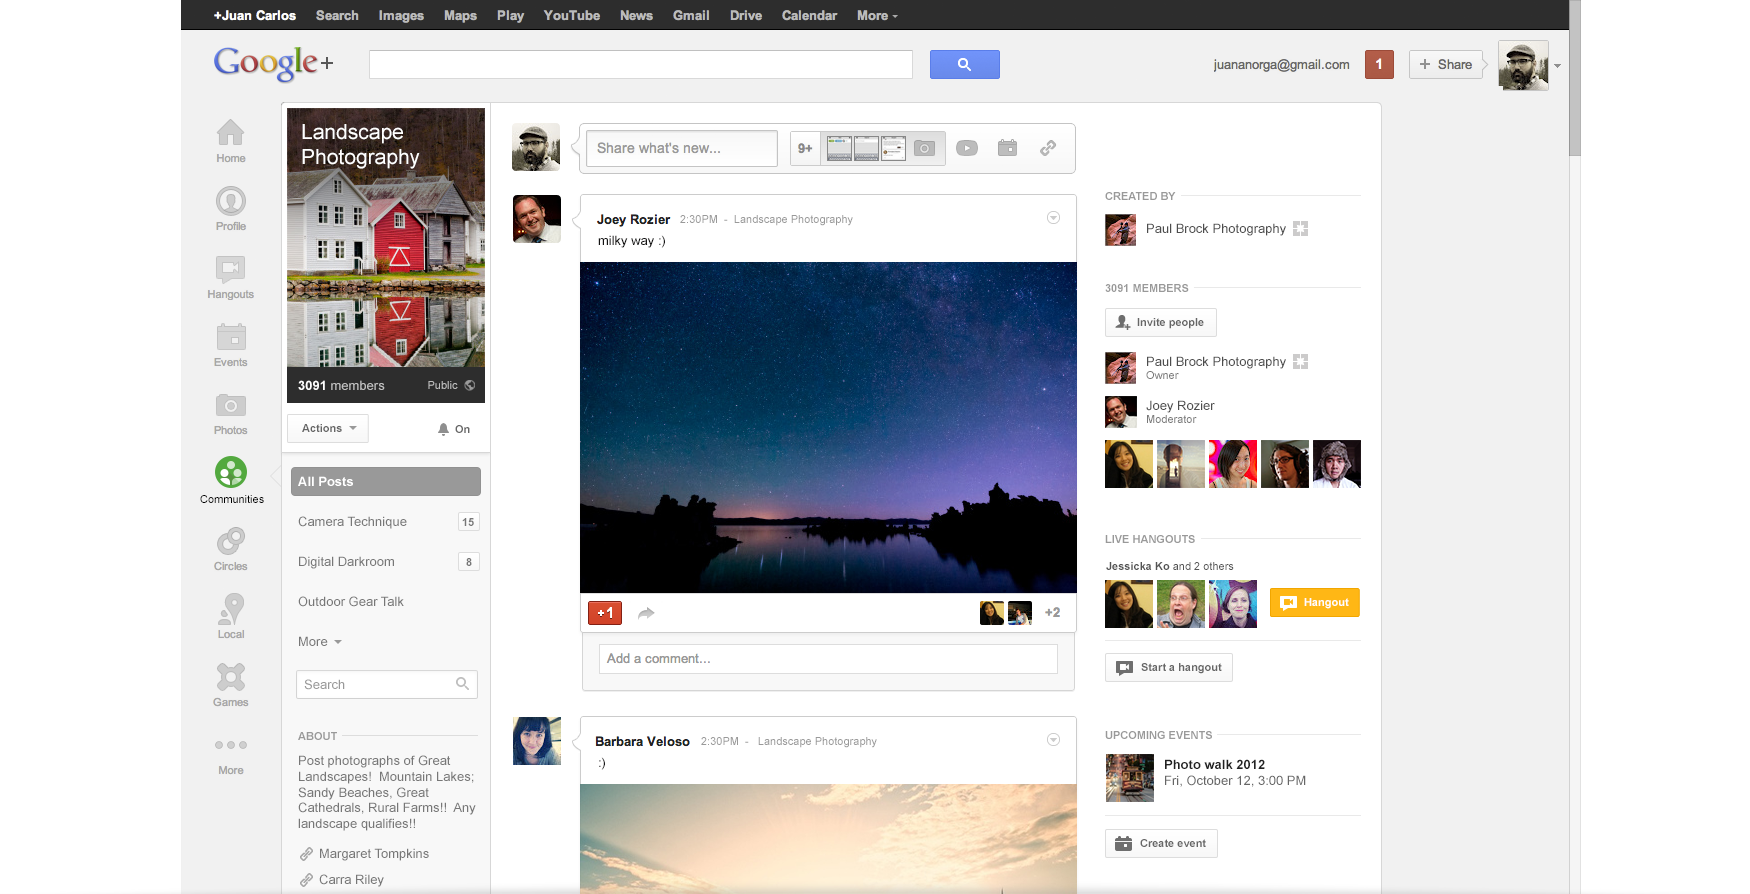 GooglePlus Helper: NEW! Google+ Groups or Communities